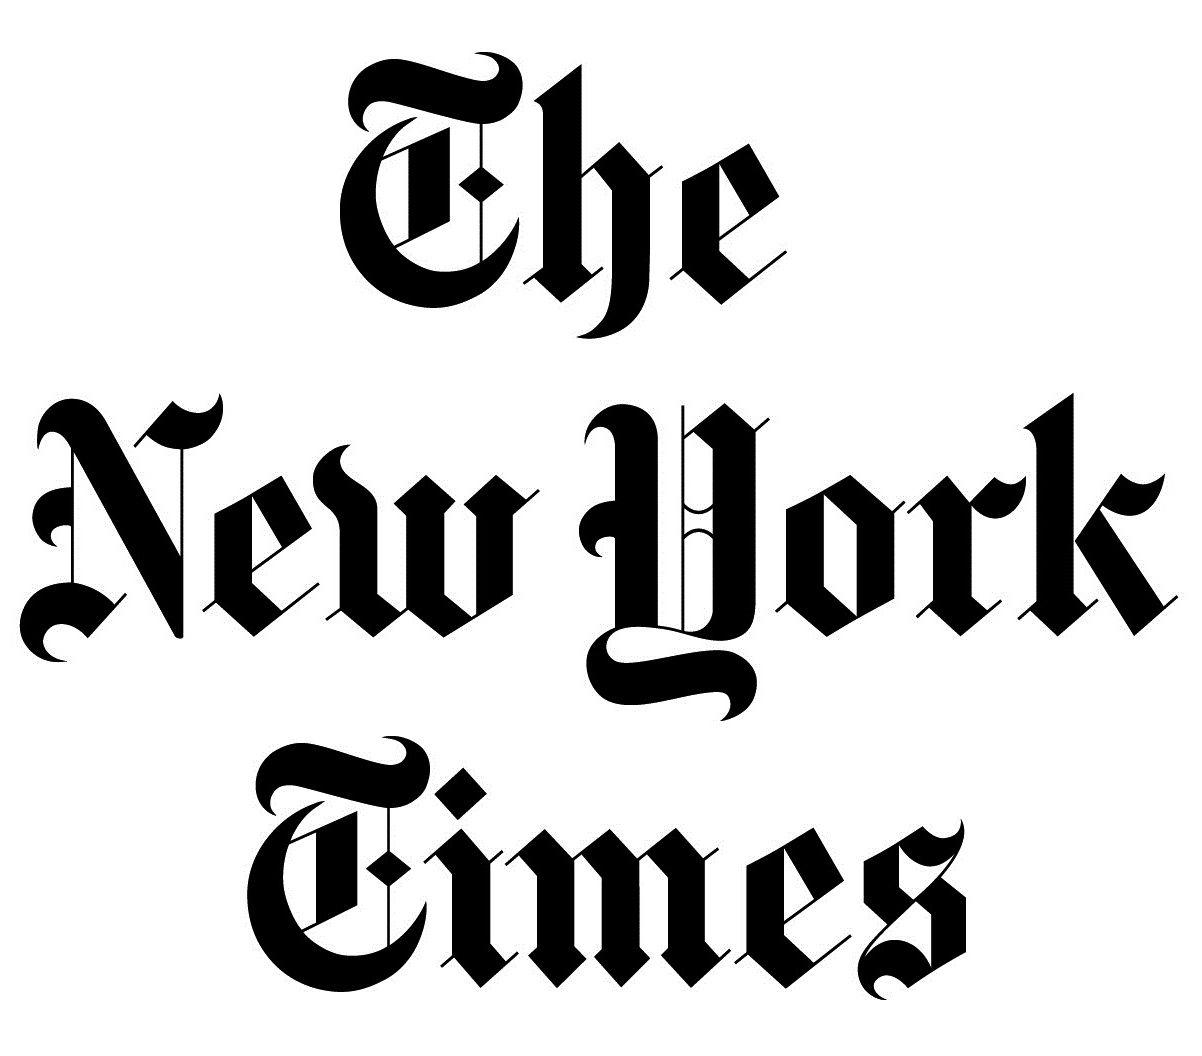 https://www.nytimes.com/2019/04/28/us/politics/trump-abortion-fact-check.html   https://www.nytimes.com/2019/02/26/health/abortion-bill-trump.html  https://www.nytimes.com/2018/05/22/us/politics/trump-abortion-limits.html